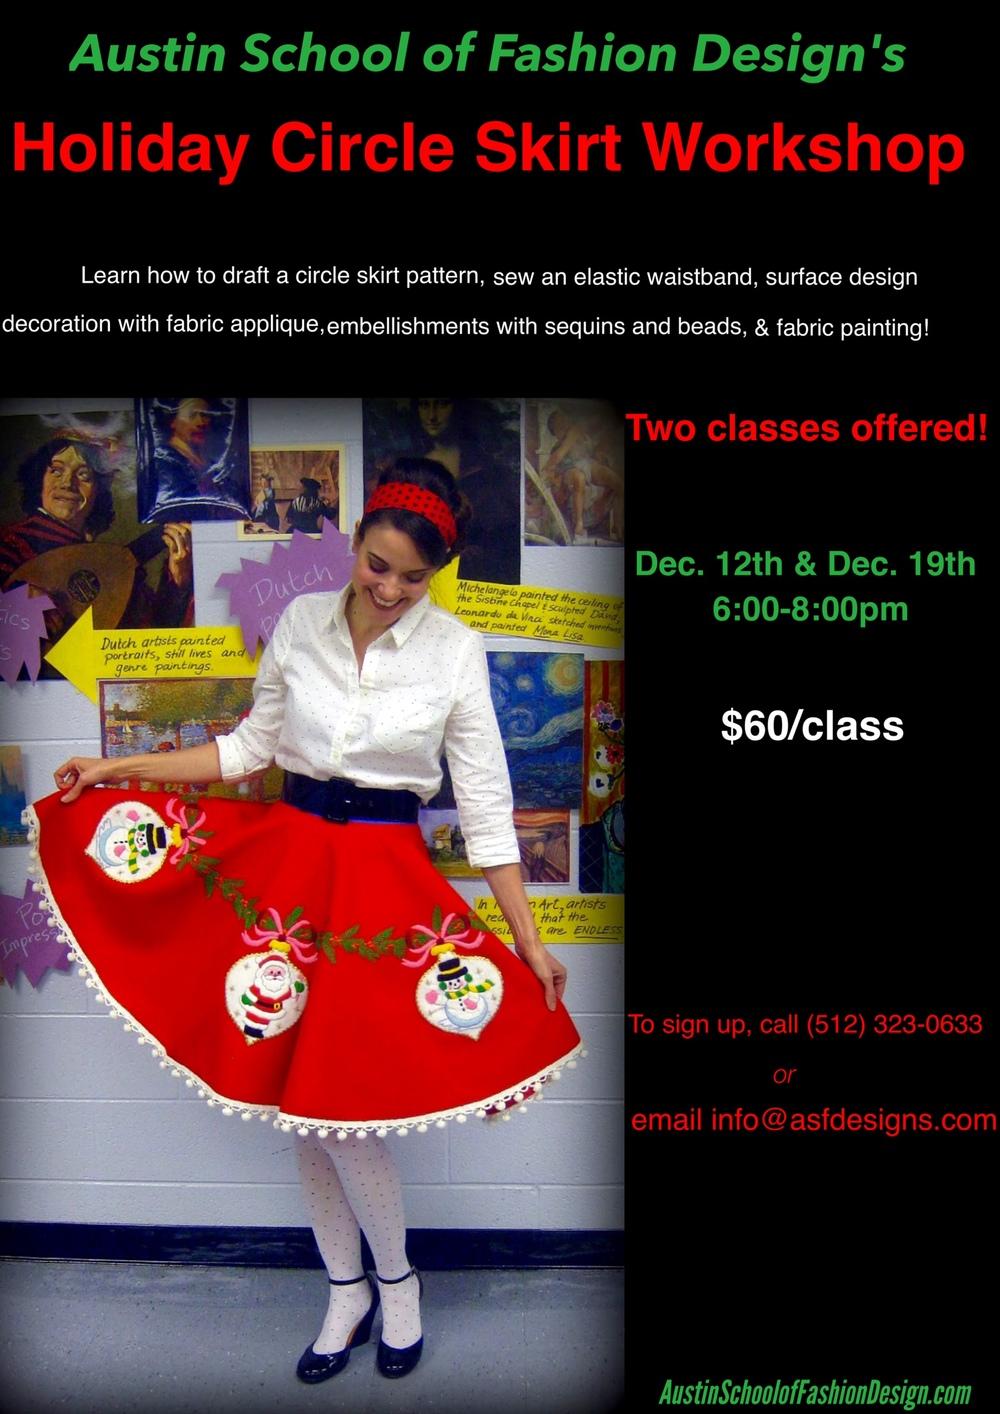 Austin School Fashion Design Holiday Circle Skirt Workshop